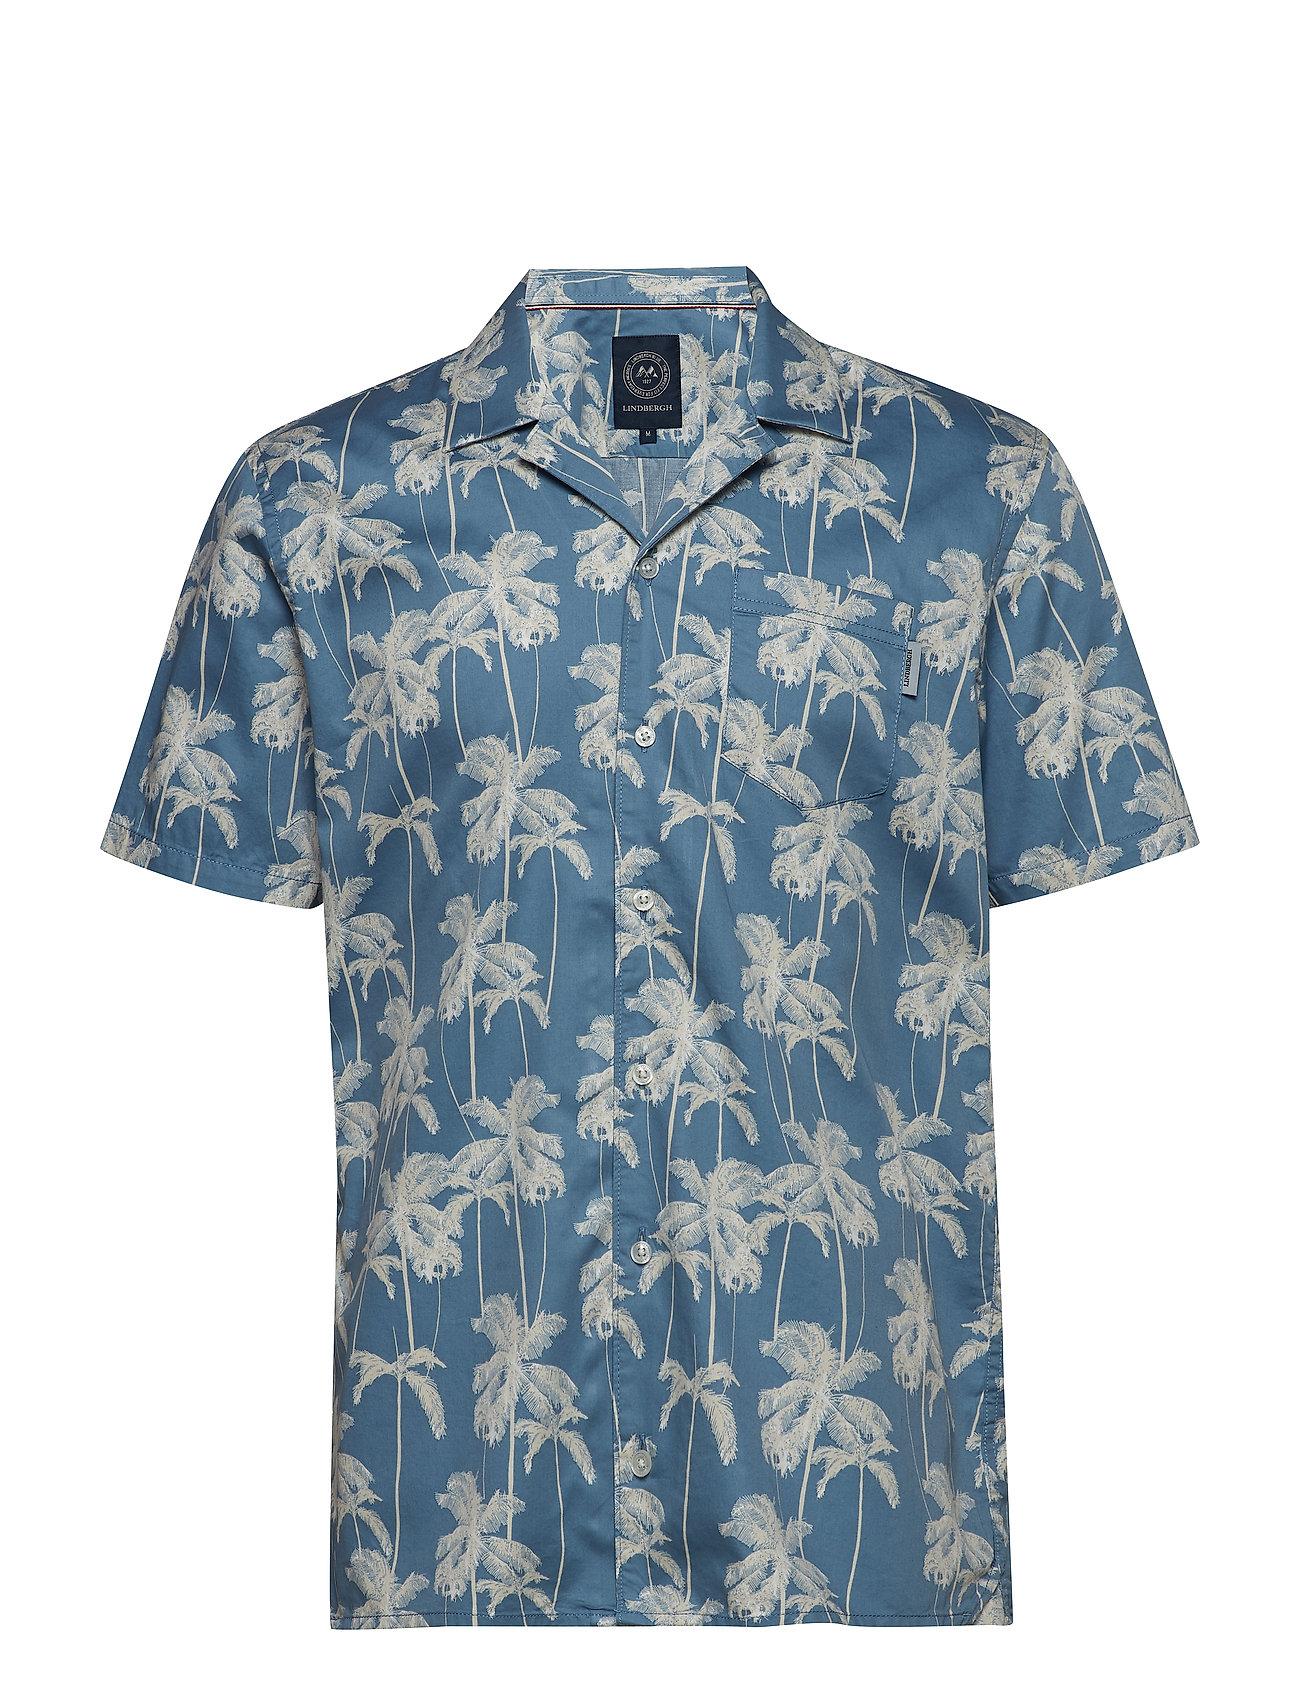 Lindbergh Hawaiian printed S/S shirt - LIGHT BLUE